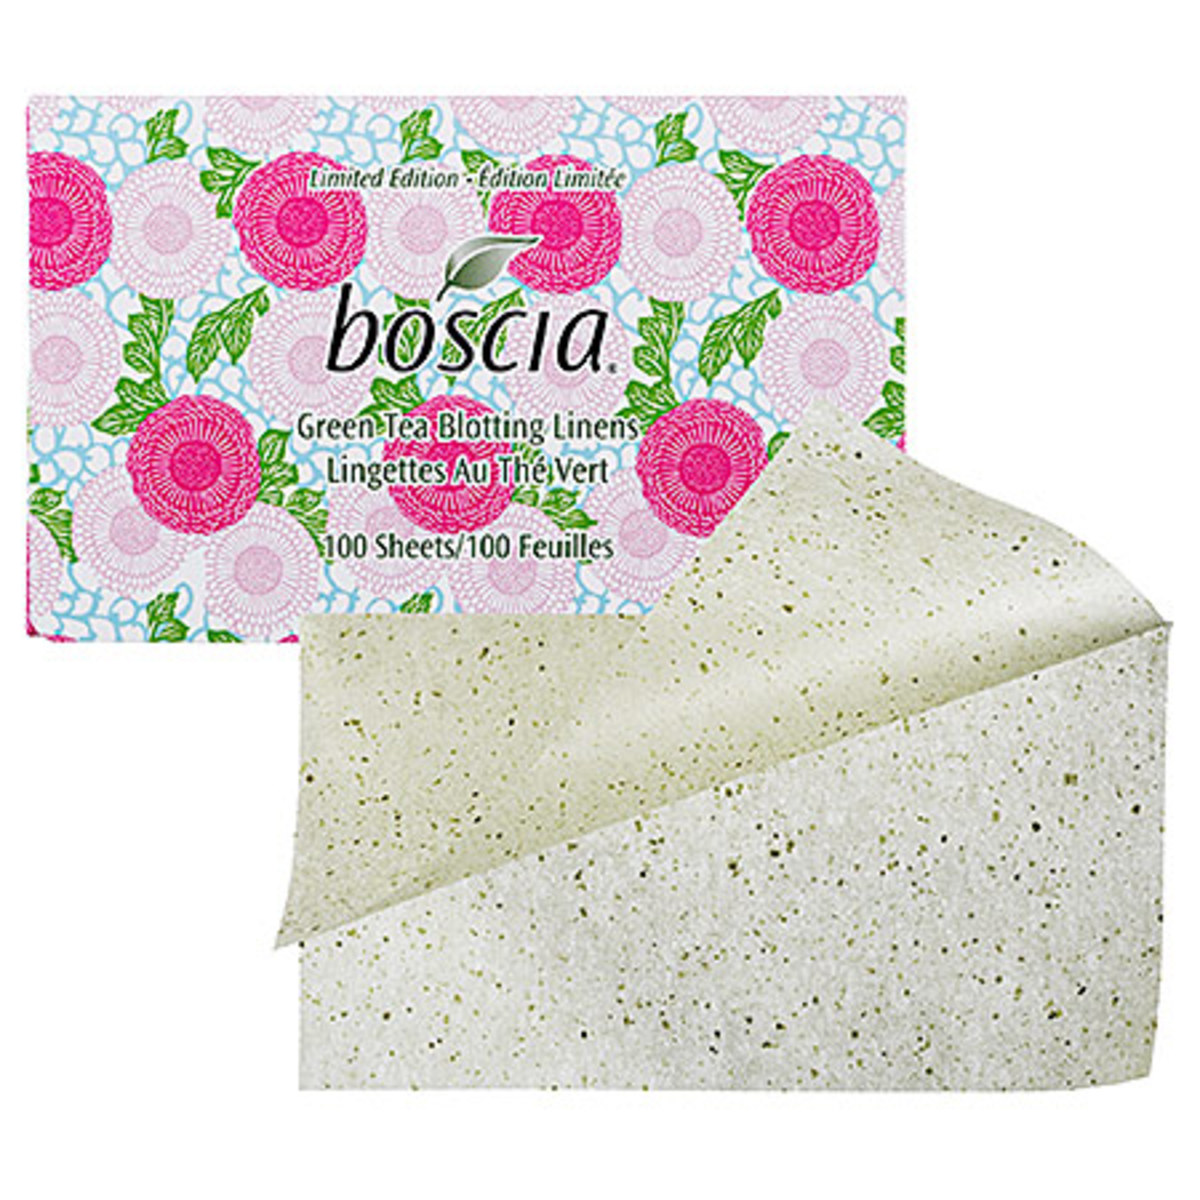 Boscia Green Tea Blotting Linens Limited Edition